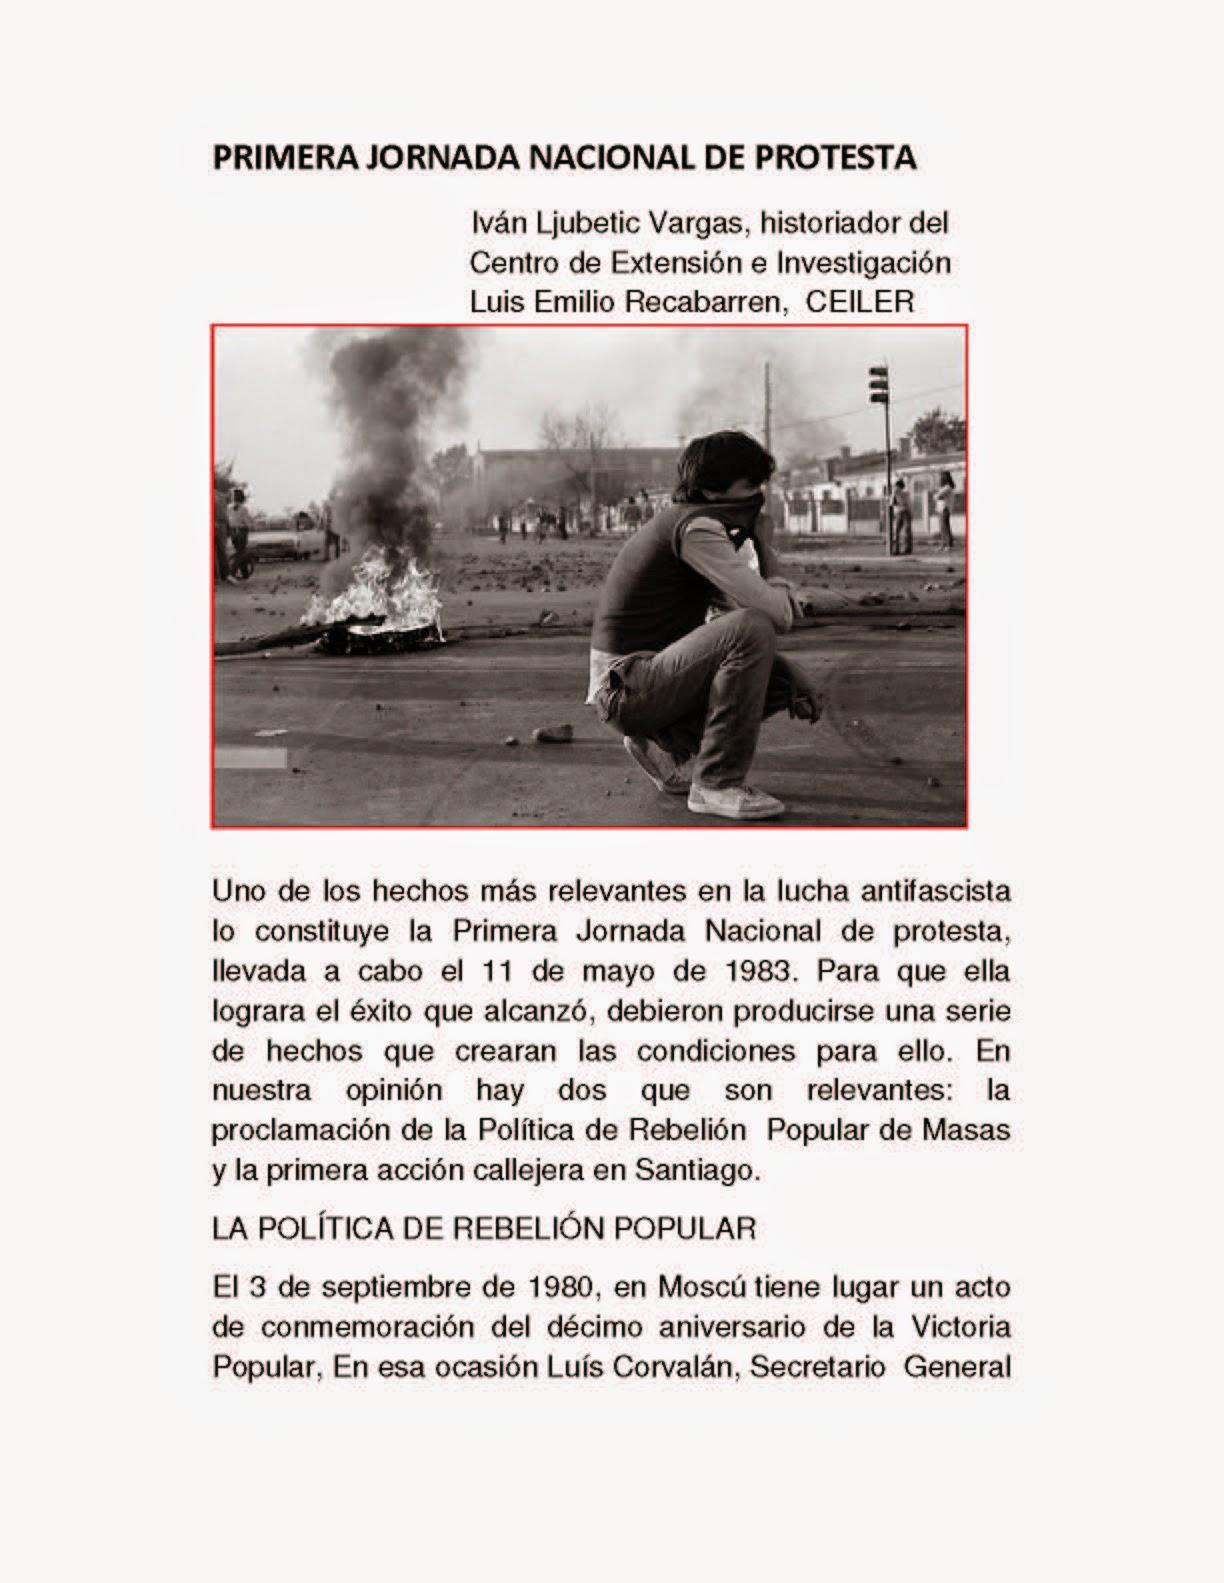 PRIMERA JORNADA NACIONAL DE PROTESTA